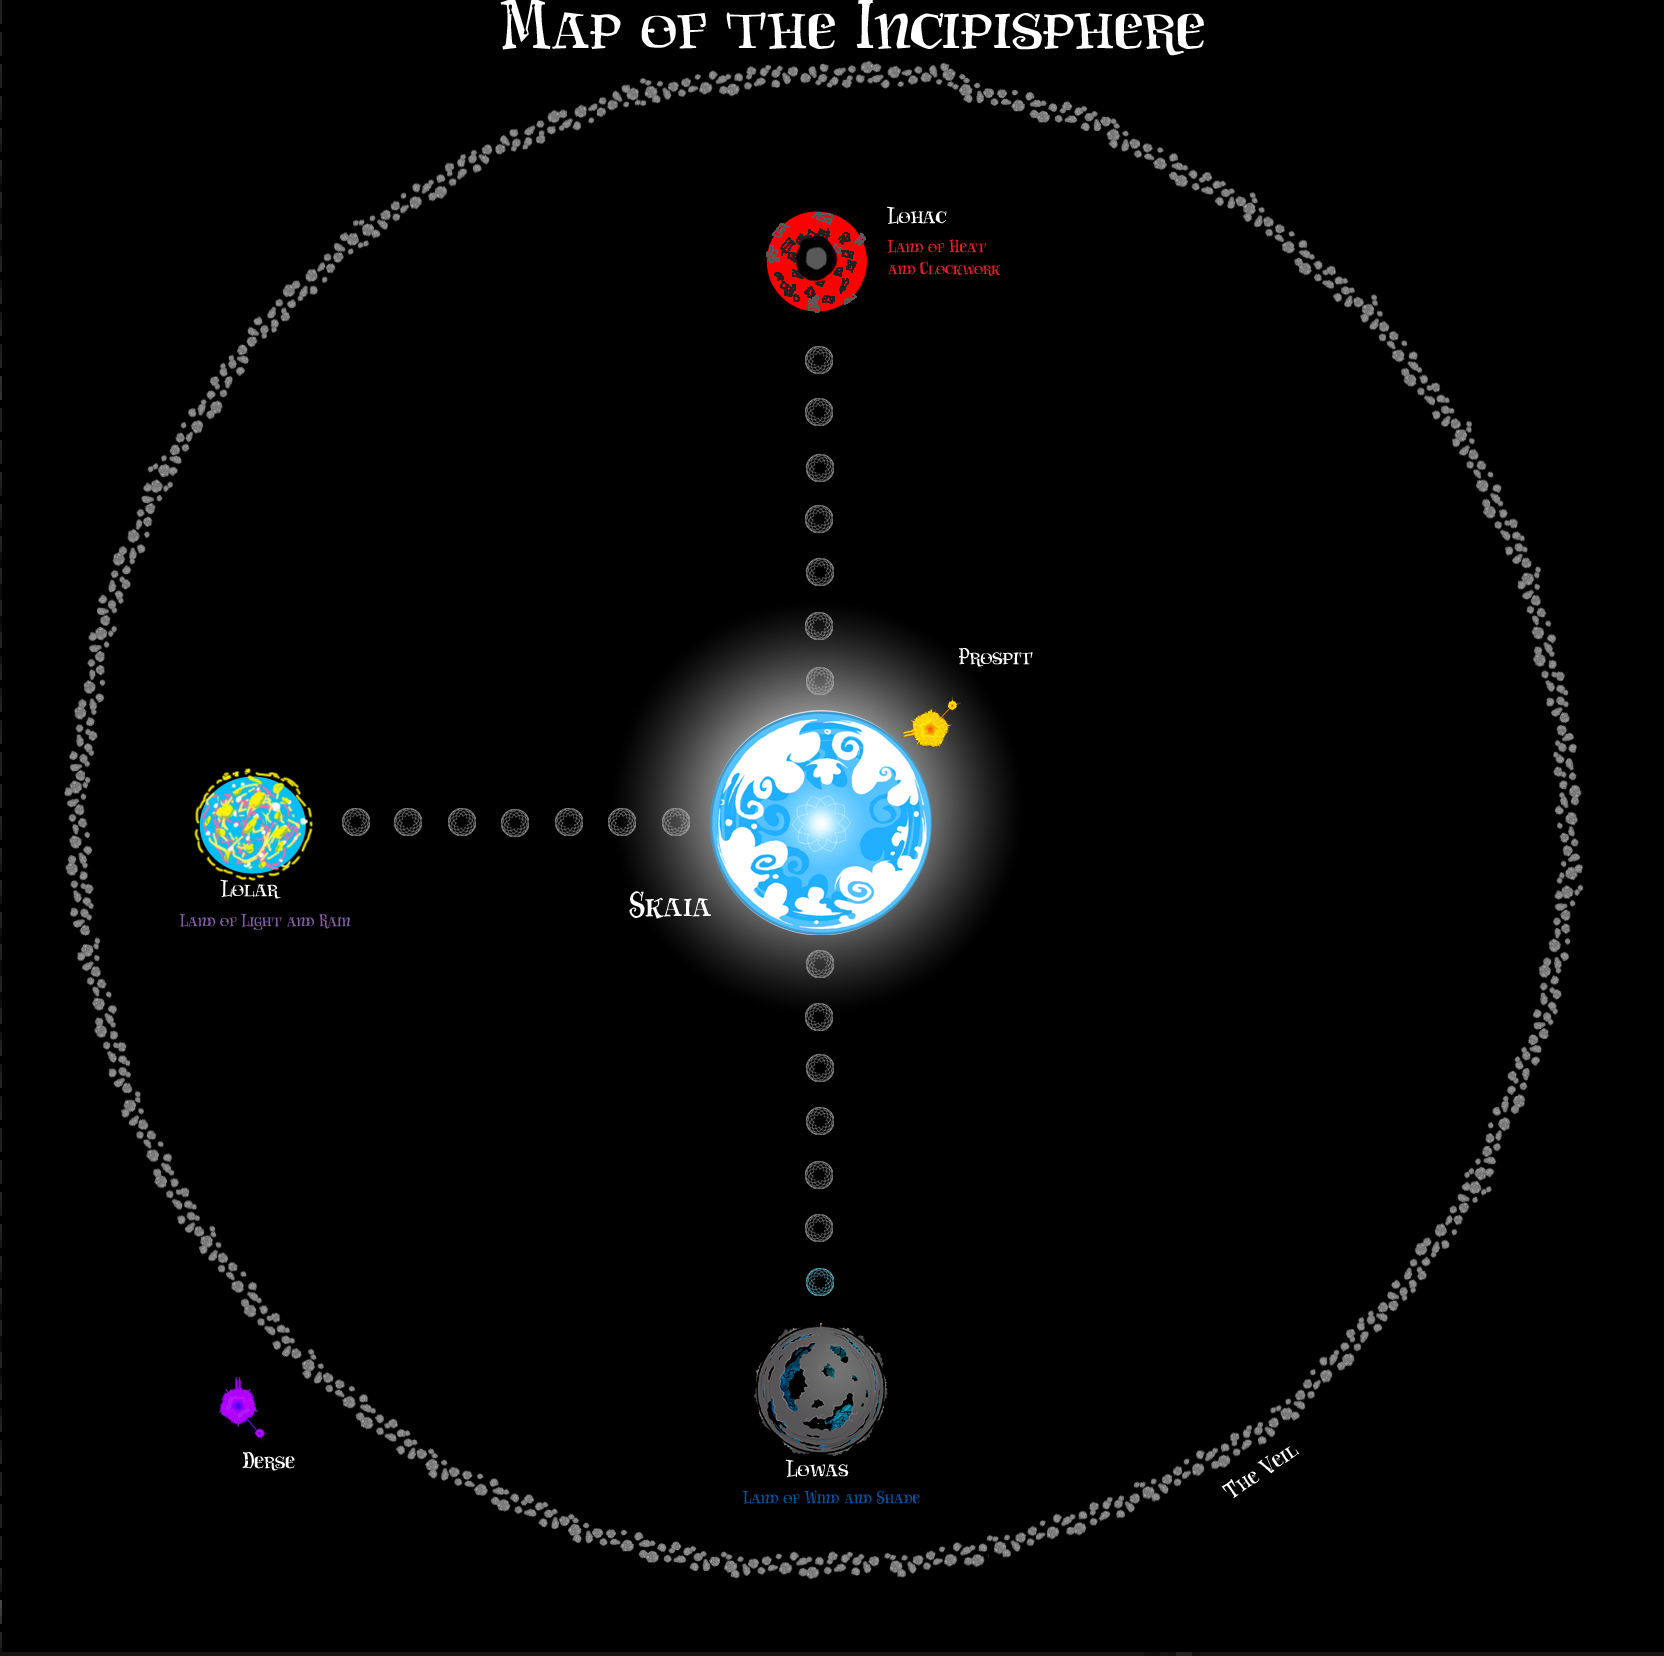 incipisphere ms paint adventures wiki fandom powered